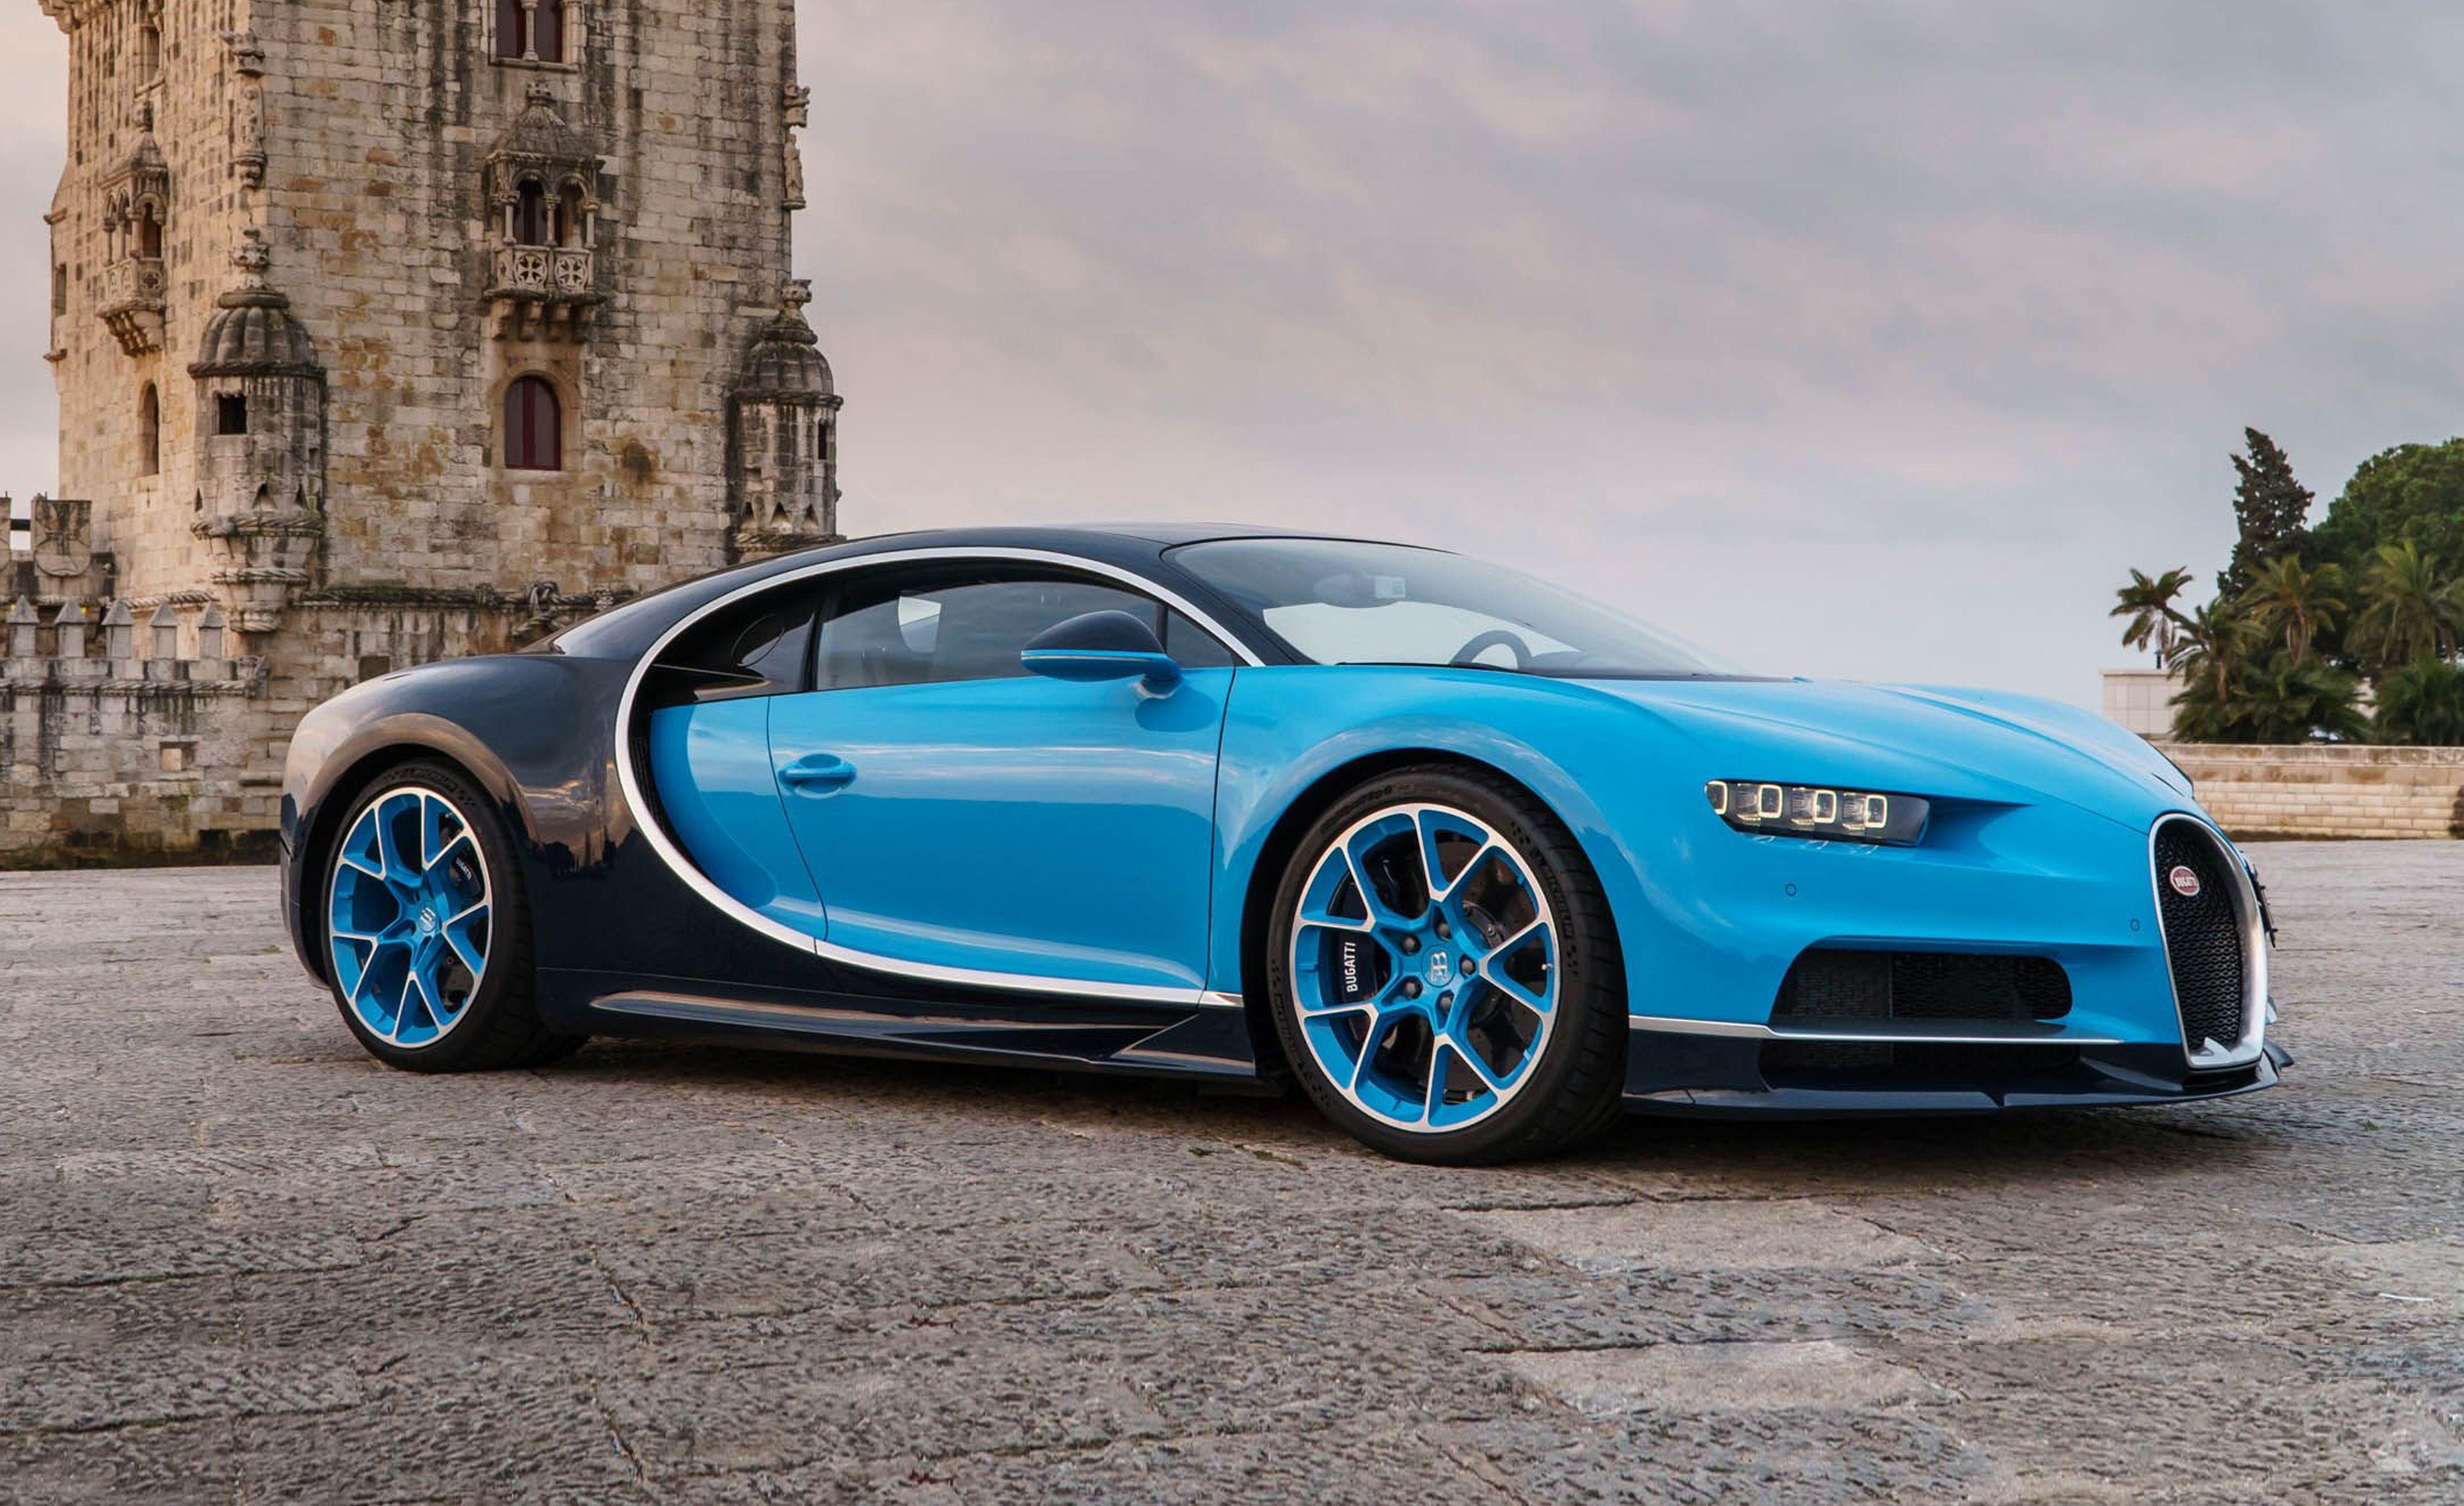 2019 Bugatti Chiron Reviews Bugatti Chiron Price Photos And